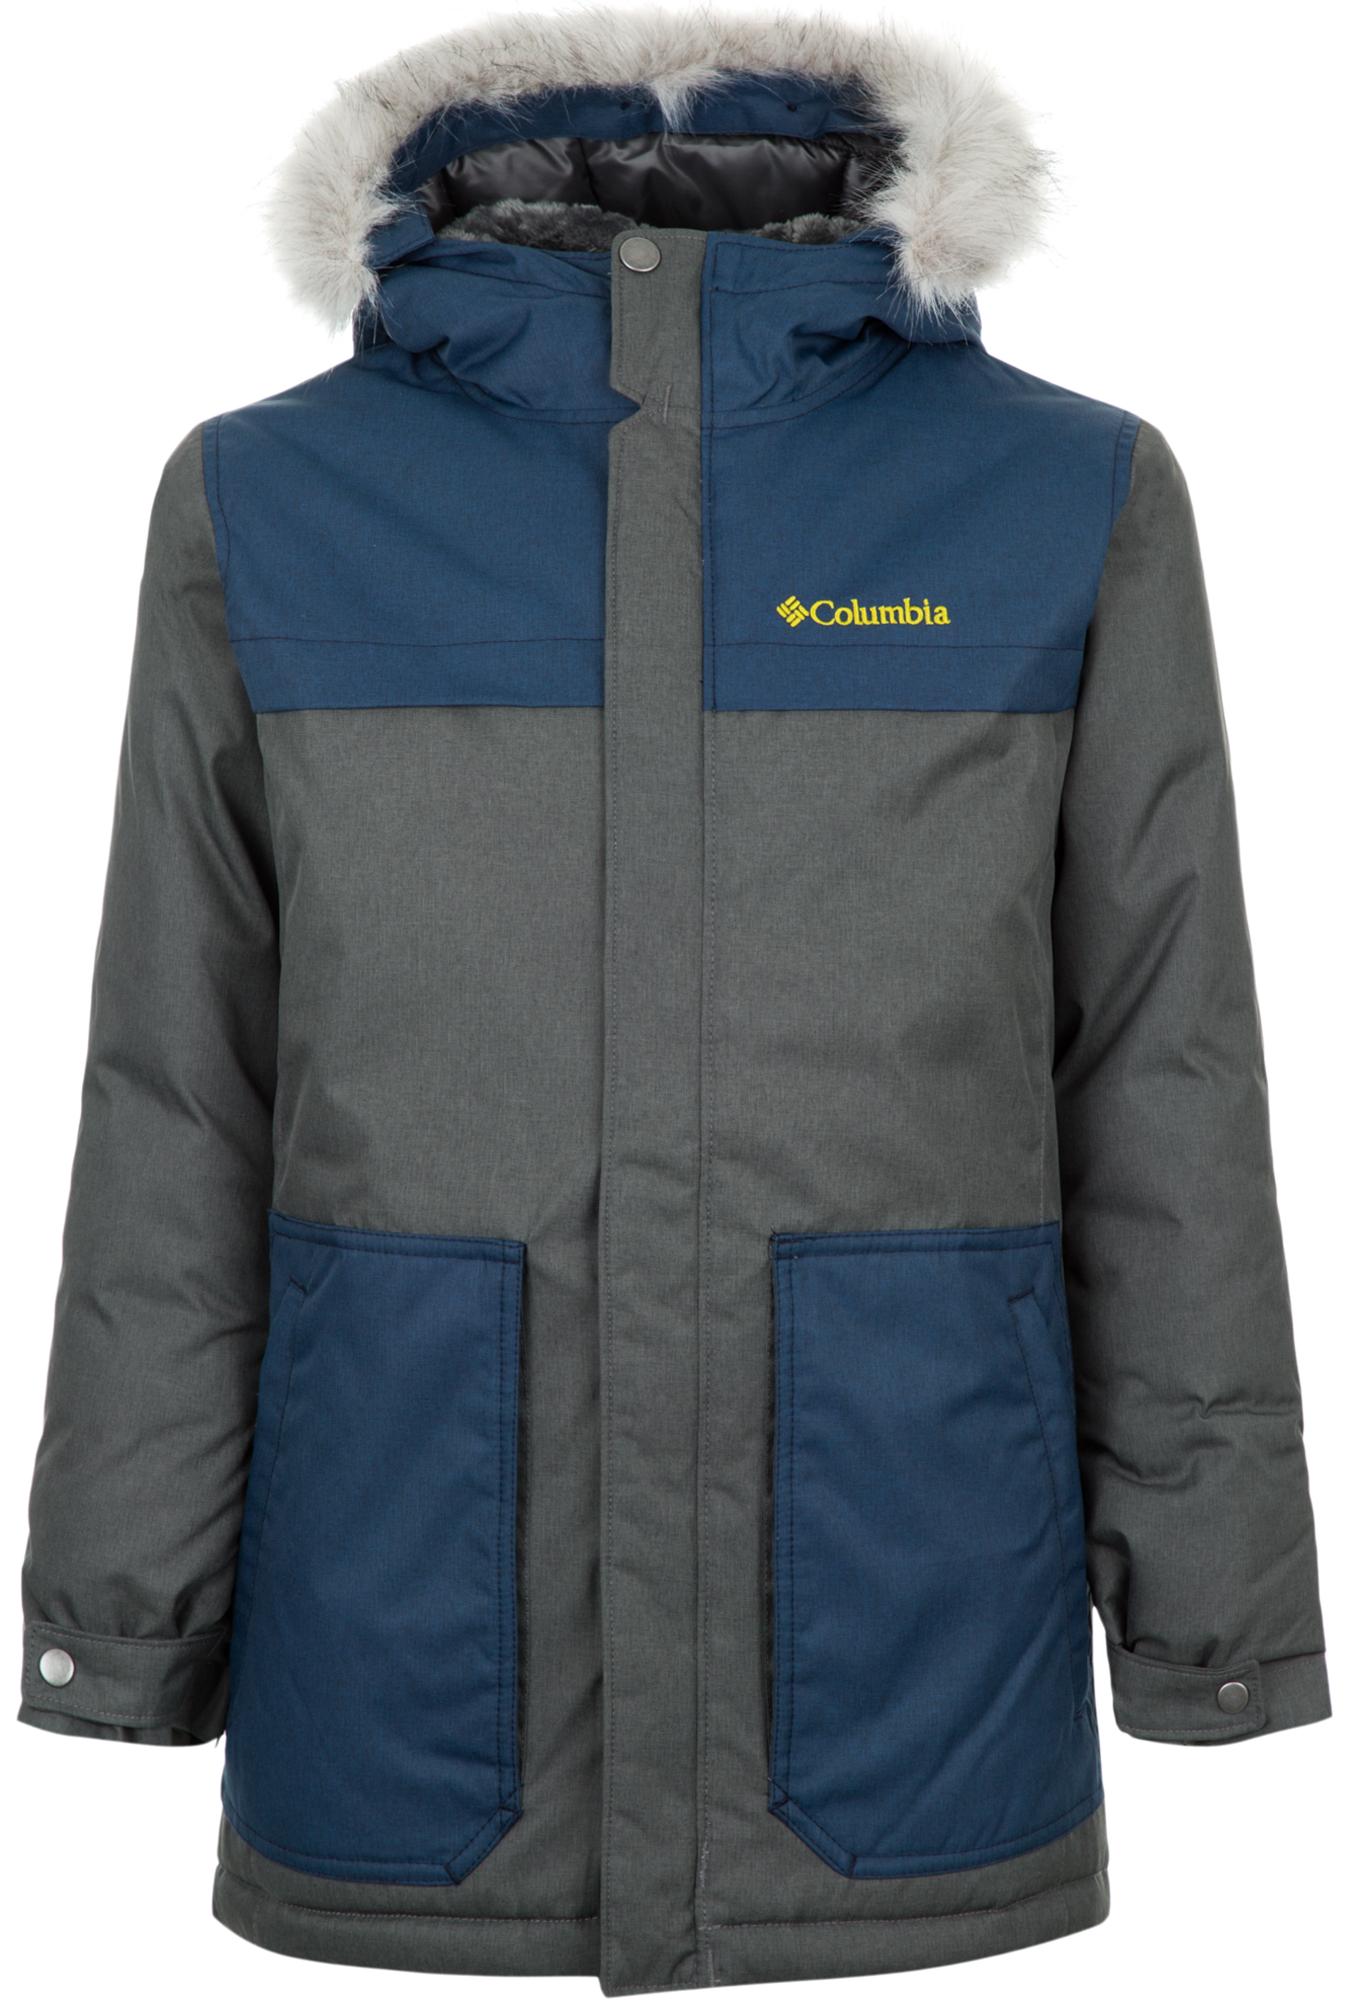 Columbia Куртка утепленная для мальчиков Columbia Timberlake Lodge, размер 150-157 justin timberlake justin timberlake 20 20 experience